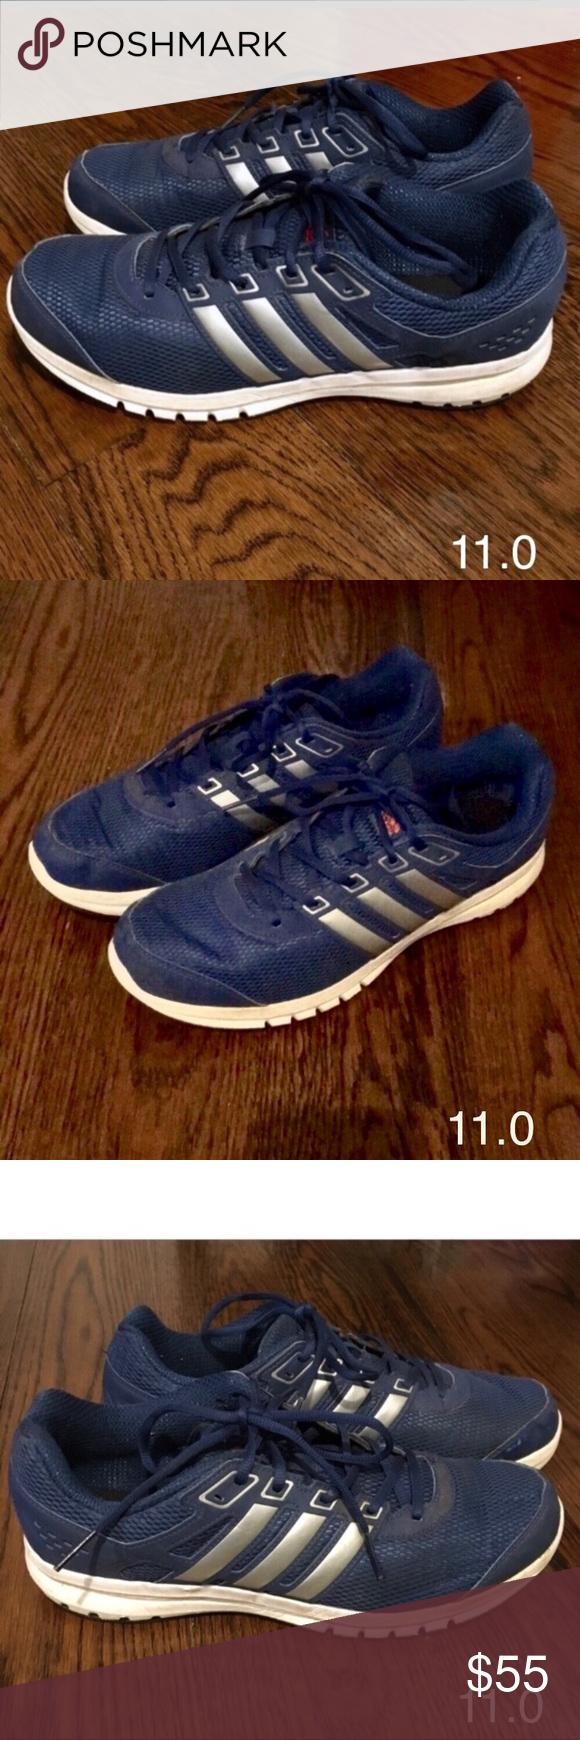 ADIDAS Duramo Lite Mens Running Shoes Size 11 Adidas Mens Duramo ...